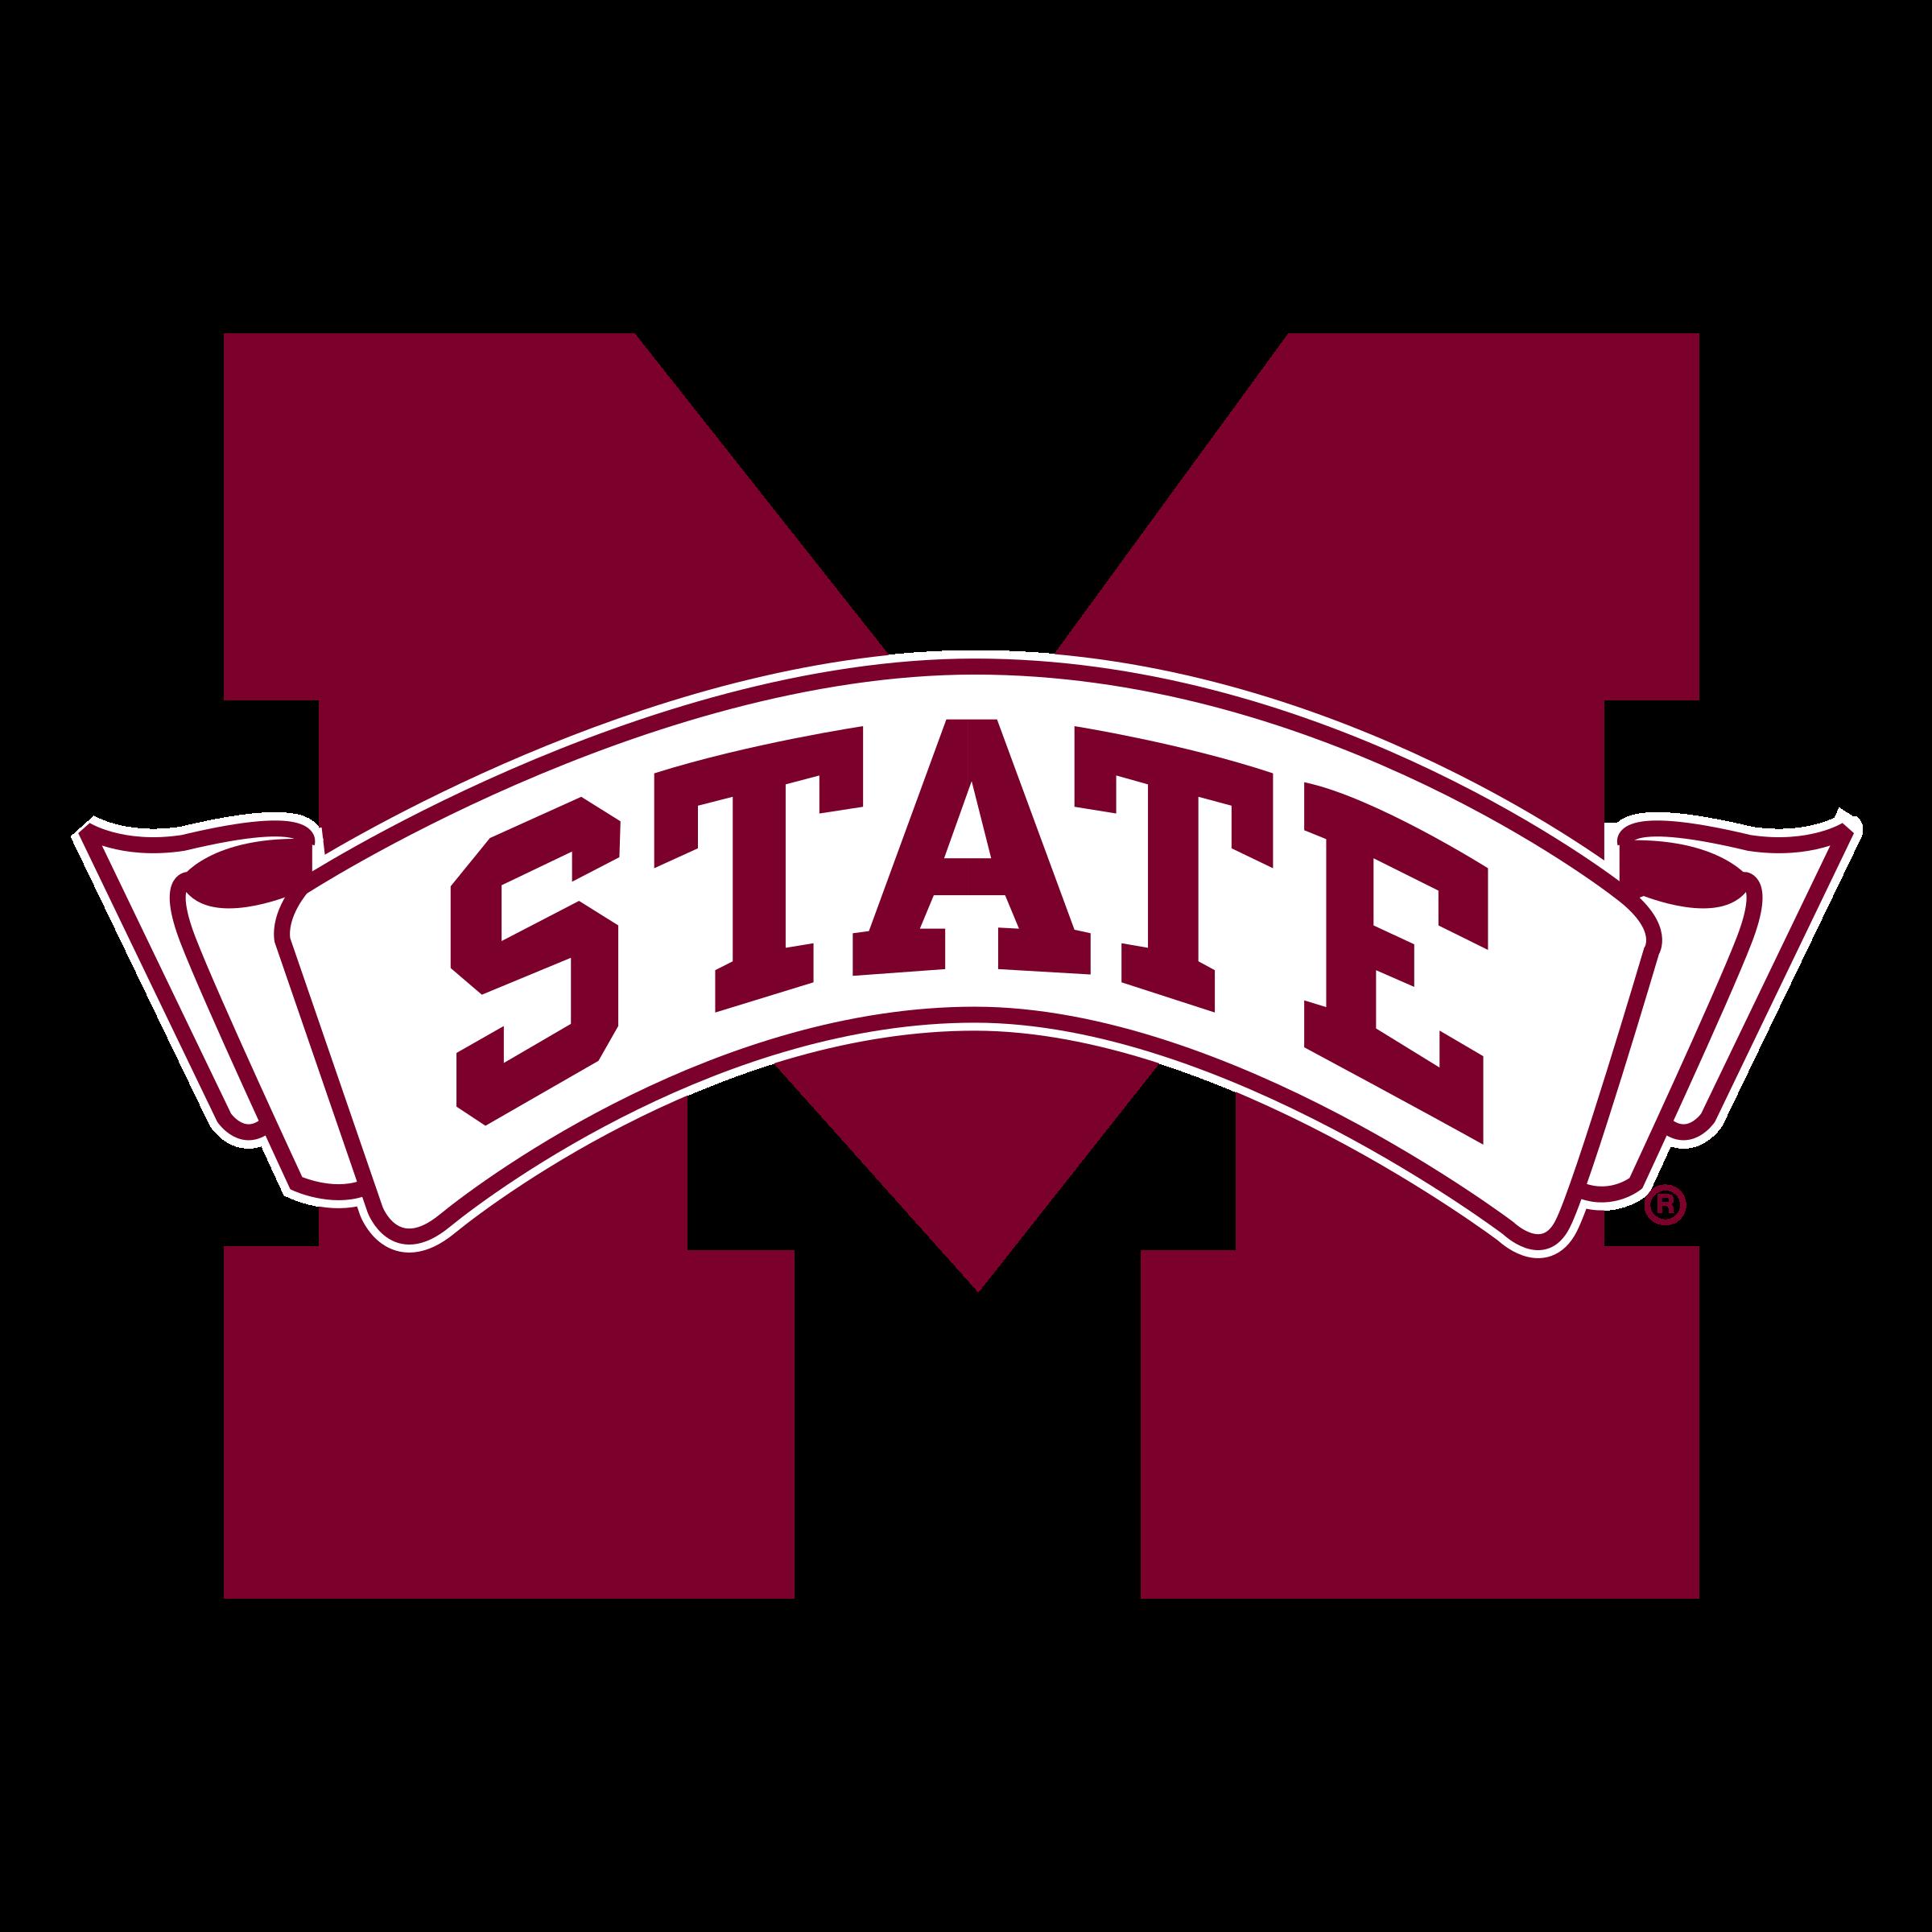 mississippi state bulldogs logo png transparent svg vector rh freebiesupply com mississippi state logo clip art mississippi state logo font